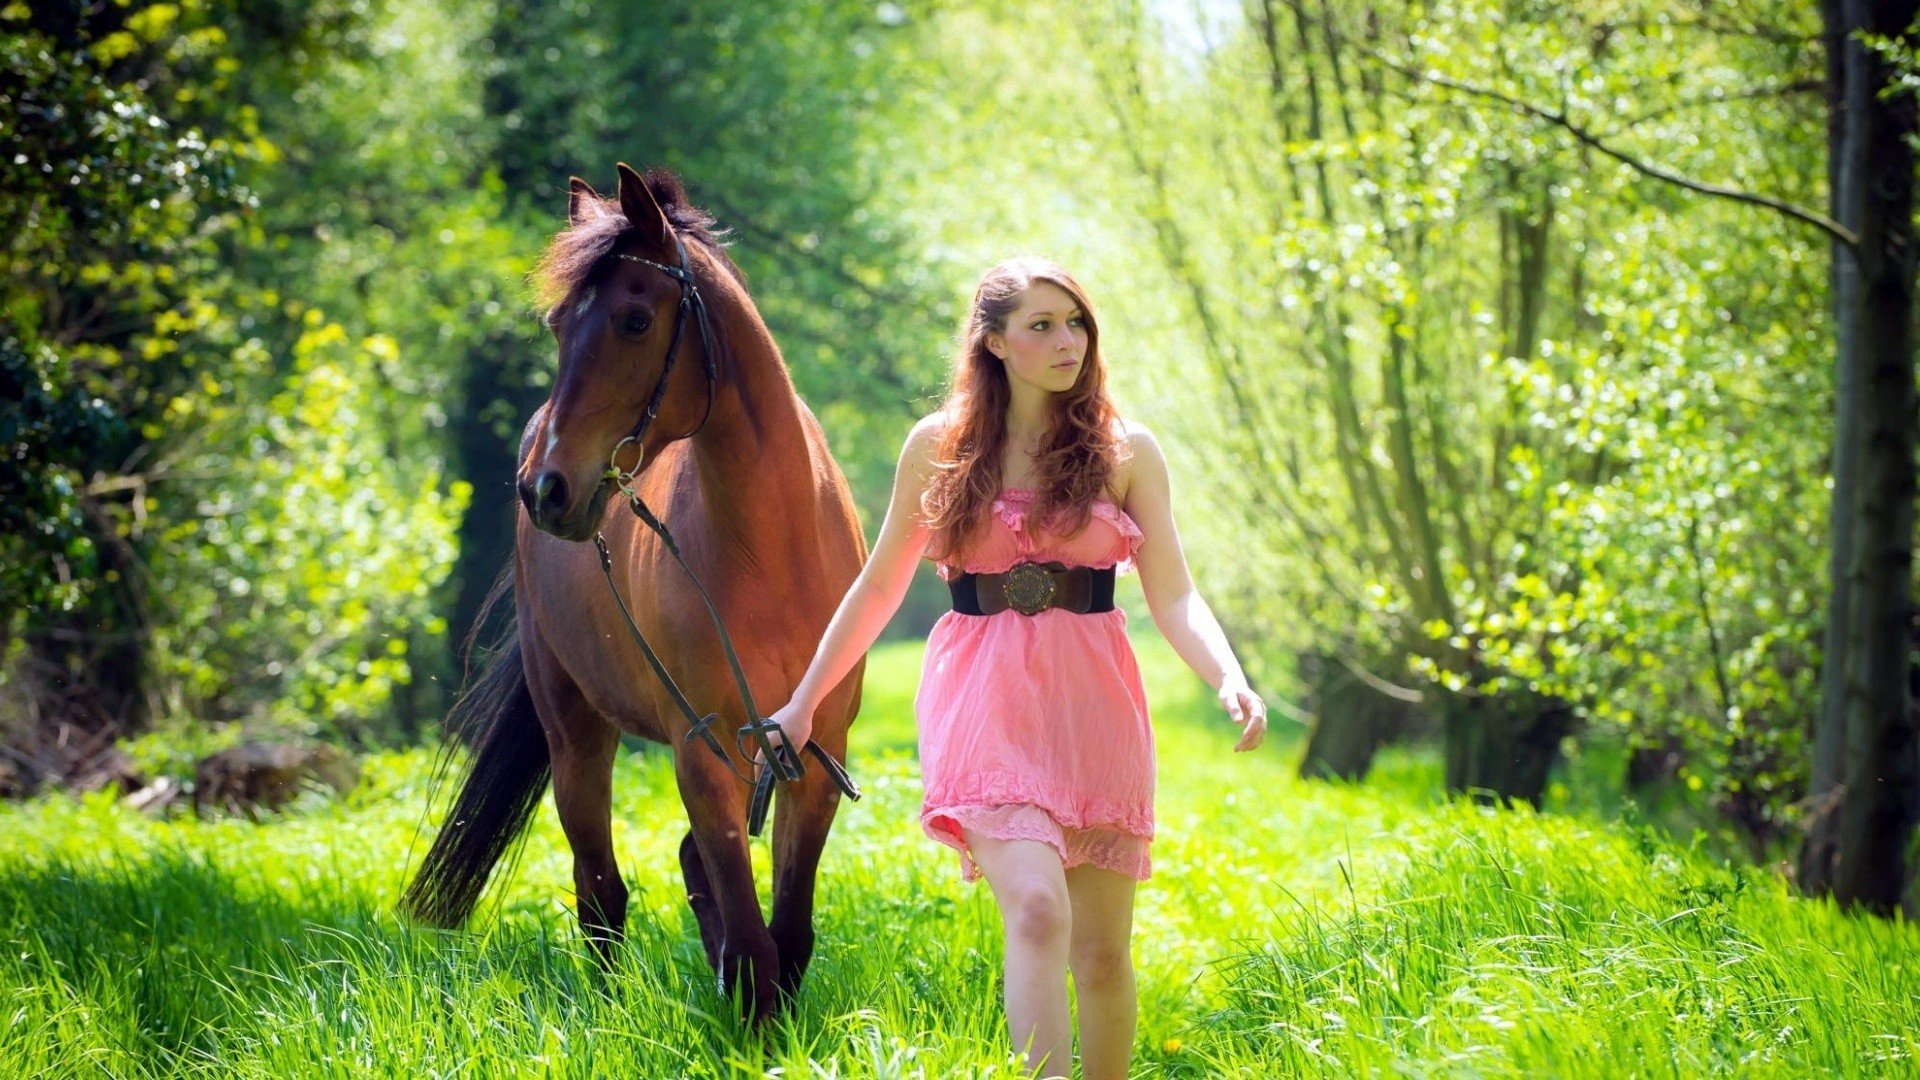 women model brunette long hair horse animals women outdoors dress nature trees grass. Black Bedroom Furniture Sets. Home Design Ideas